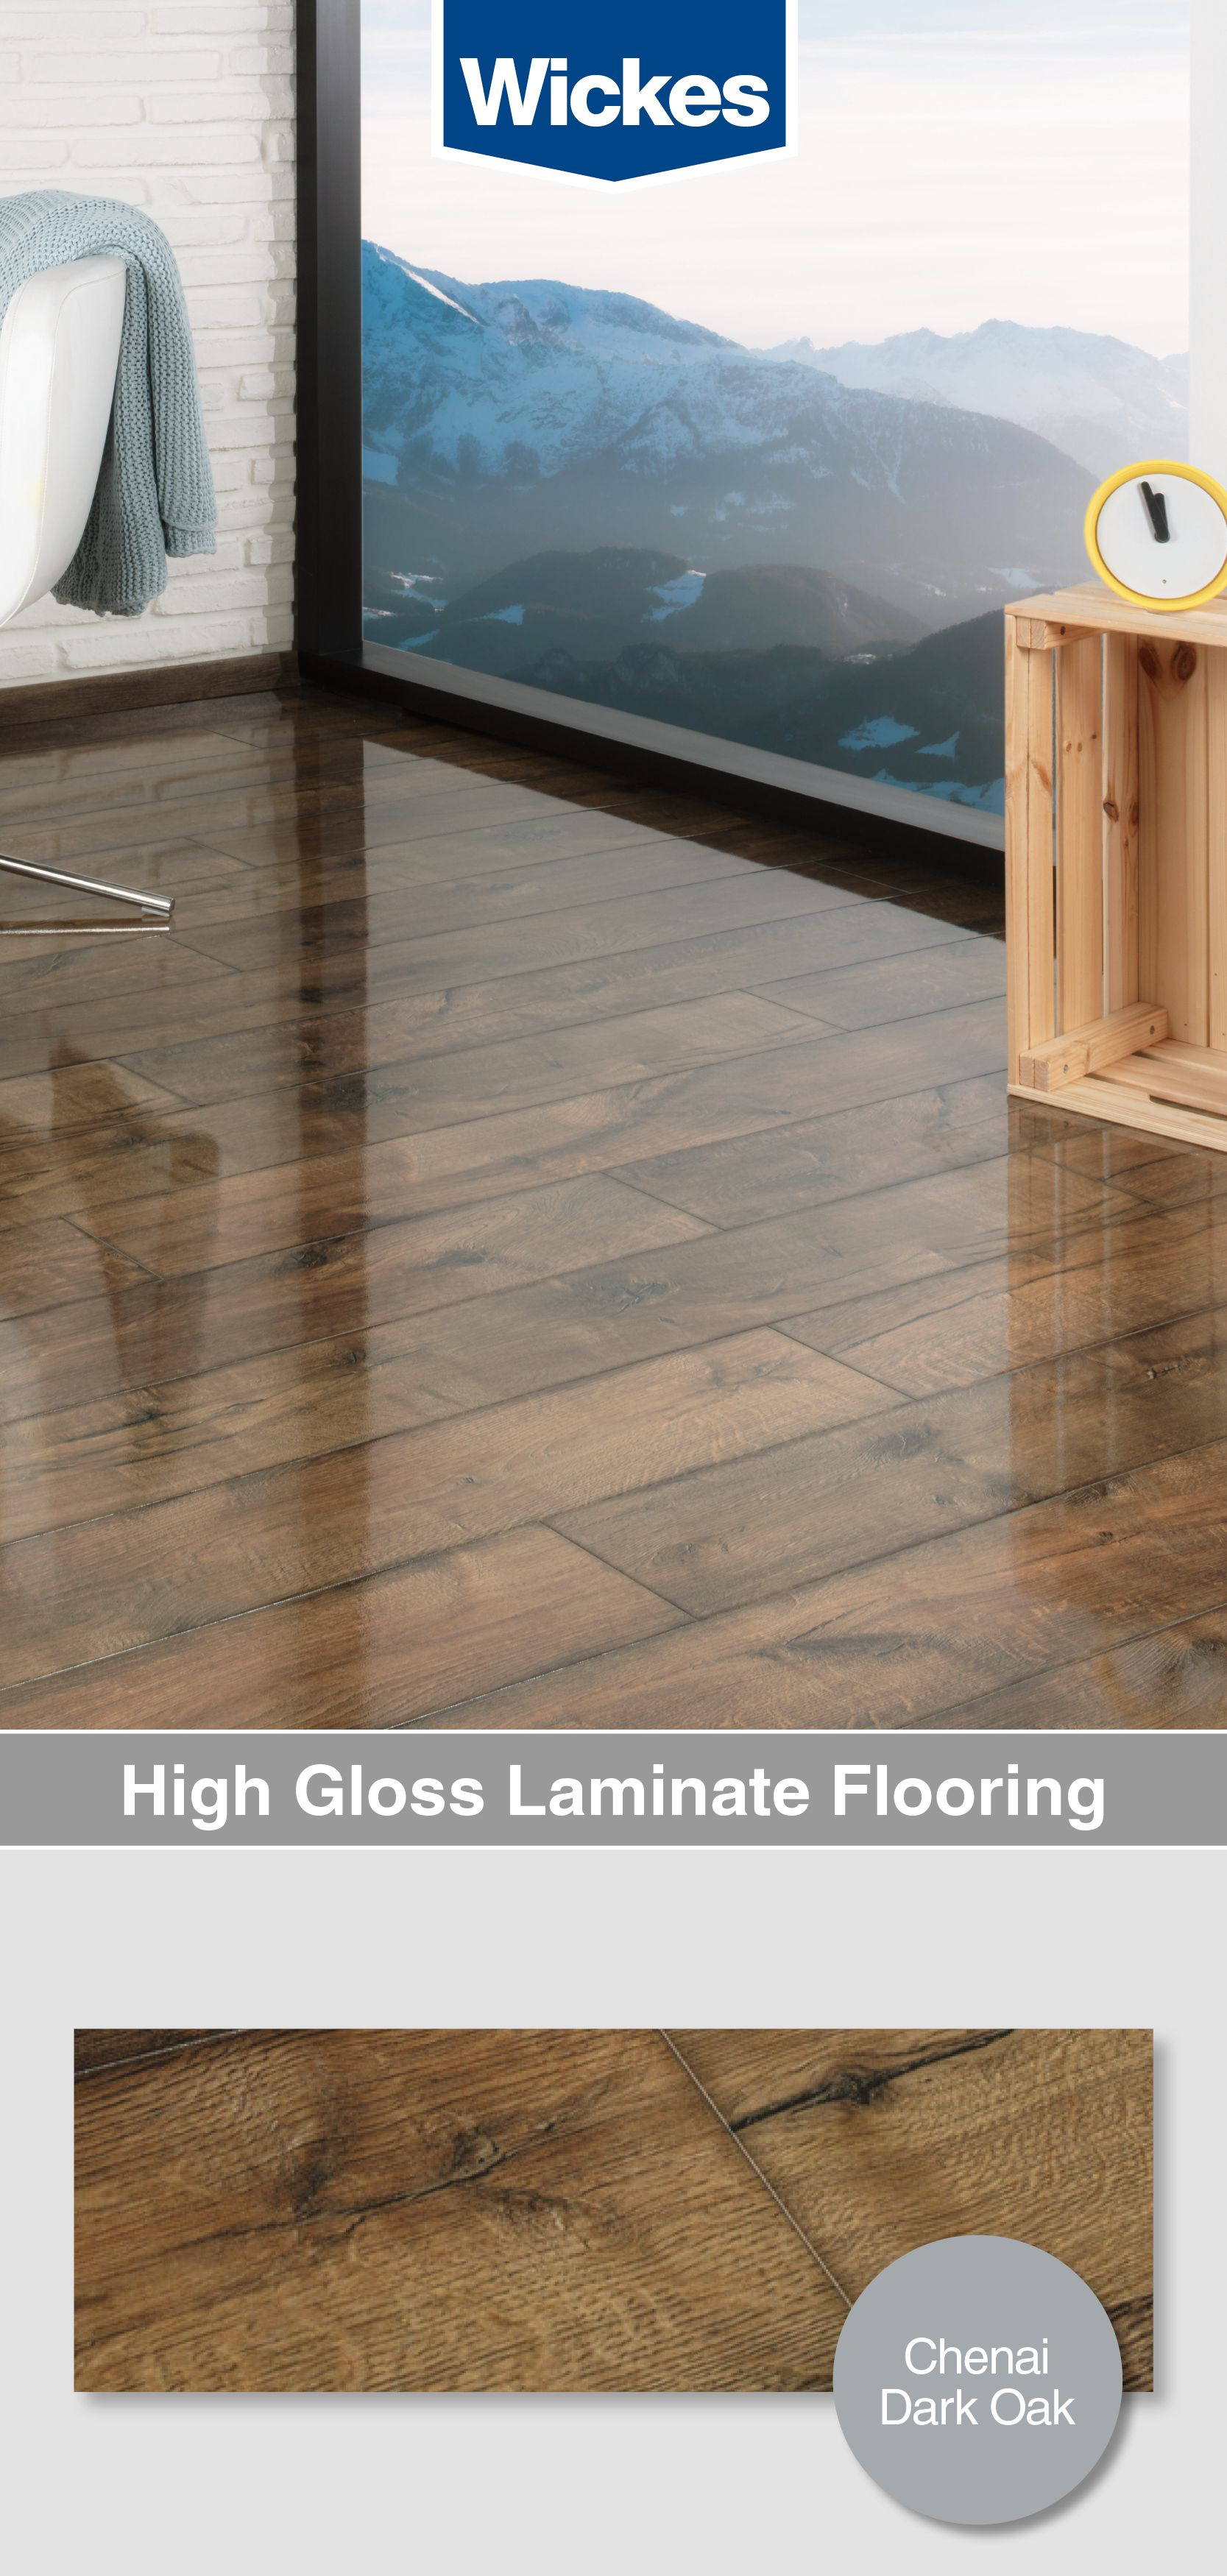 Wickes Chenai Dark Oak High Gloss Laminate Flooring 2